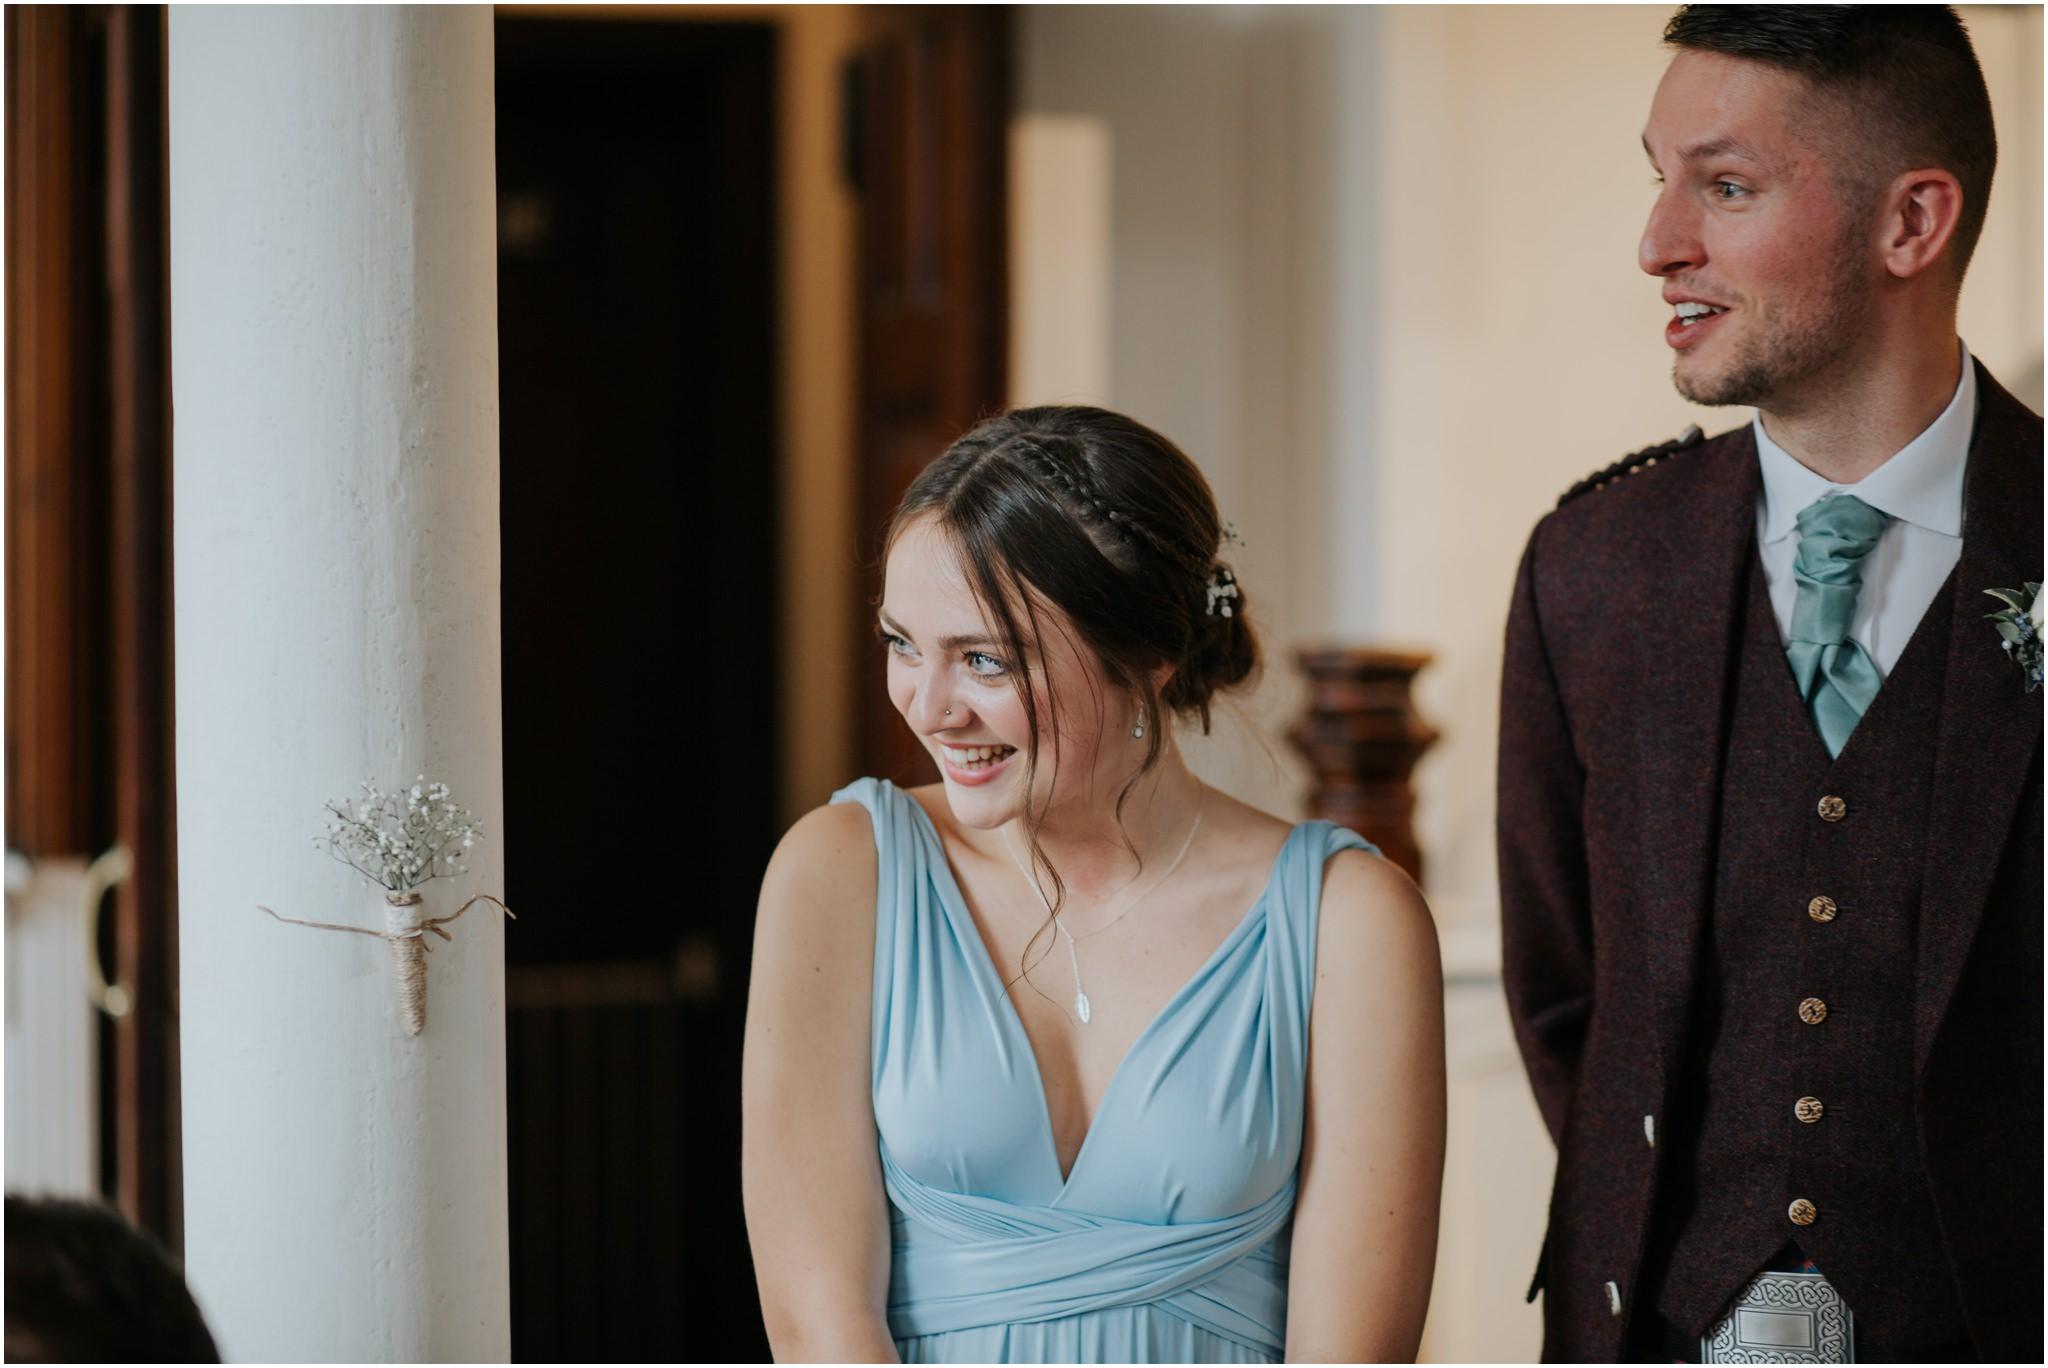 Photography 78 - Glasgow Wedding Photographer - Jordan & Abi - The Waterside Hotel, West Kilbride_0066.jpg